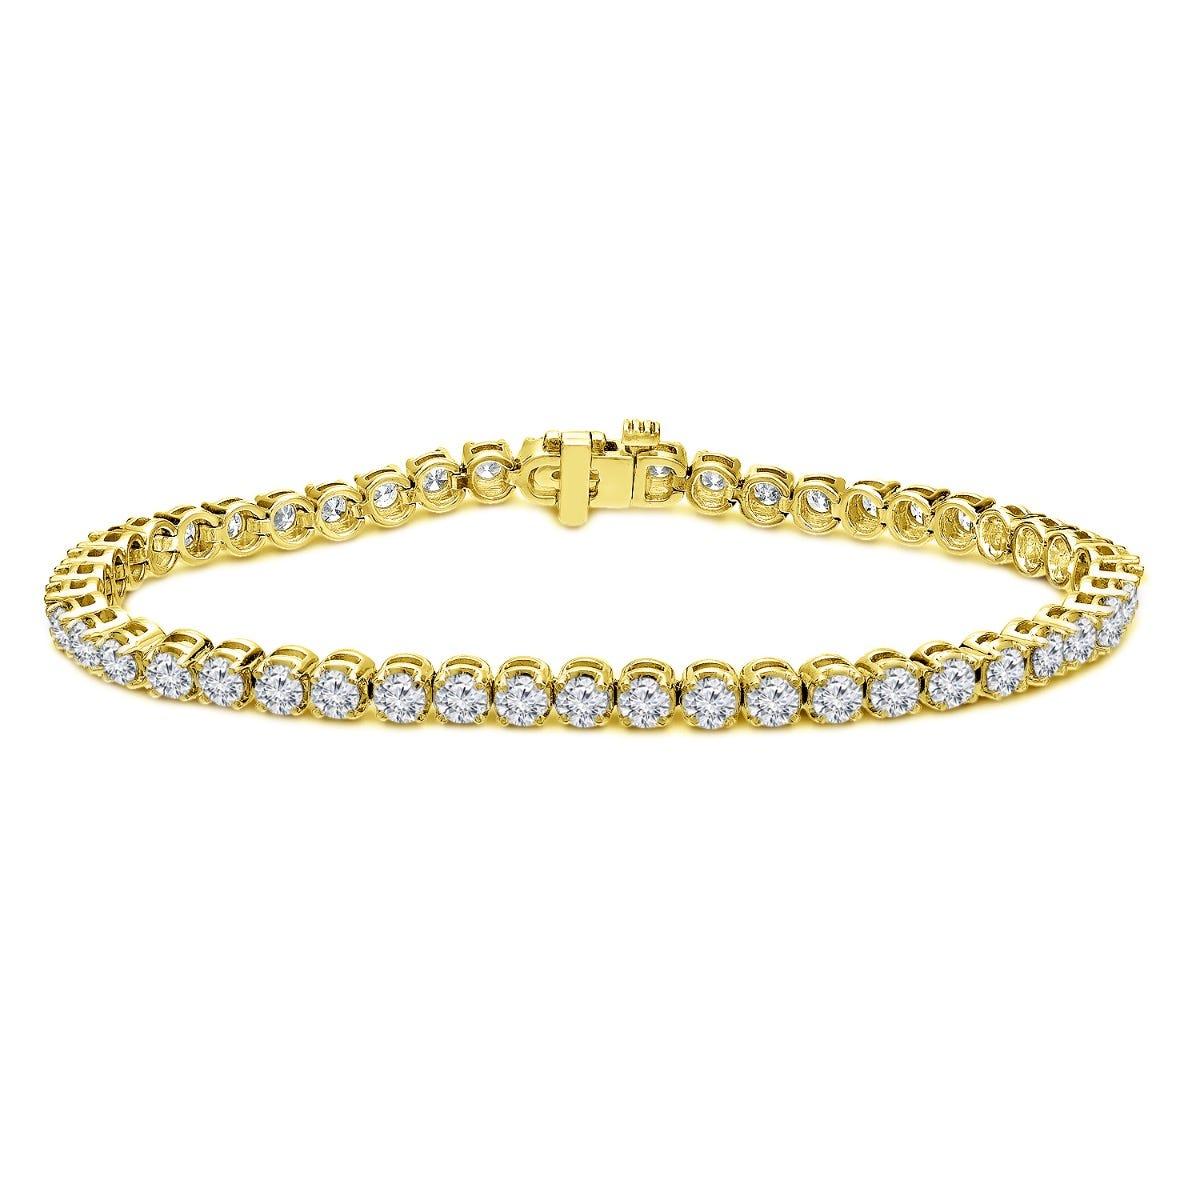 4ctw. 4-Prong Round Link Diamond Tennis Bracelet in 14K Yellow Gold (HI, SI1-SI2, 48-Stone)